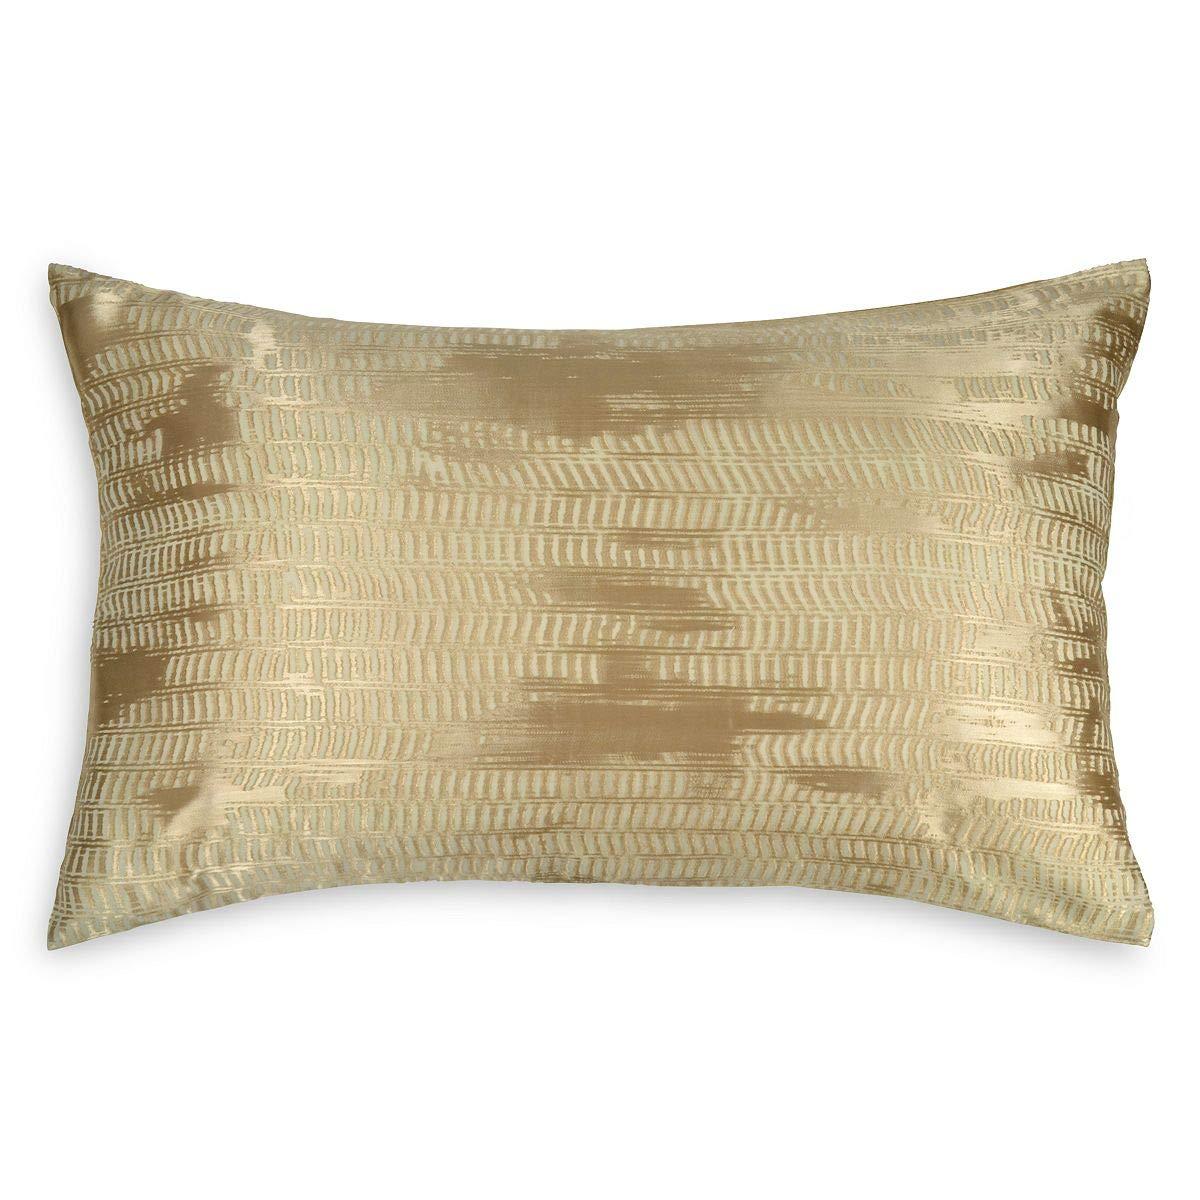 Donna Karan Home Vapor Collection Cotton King Pillow Sham Gold Dust